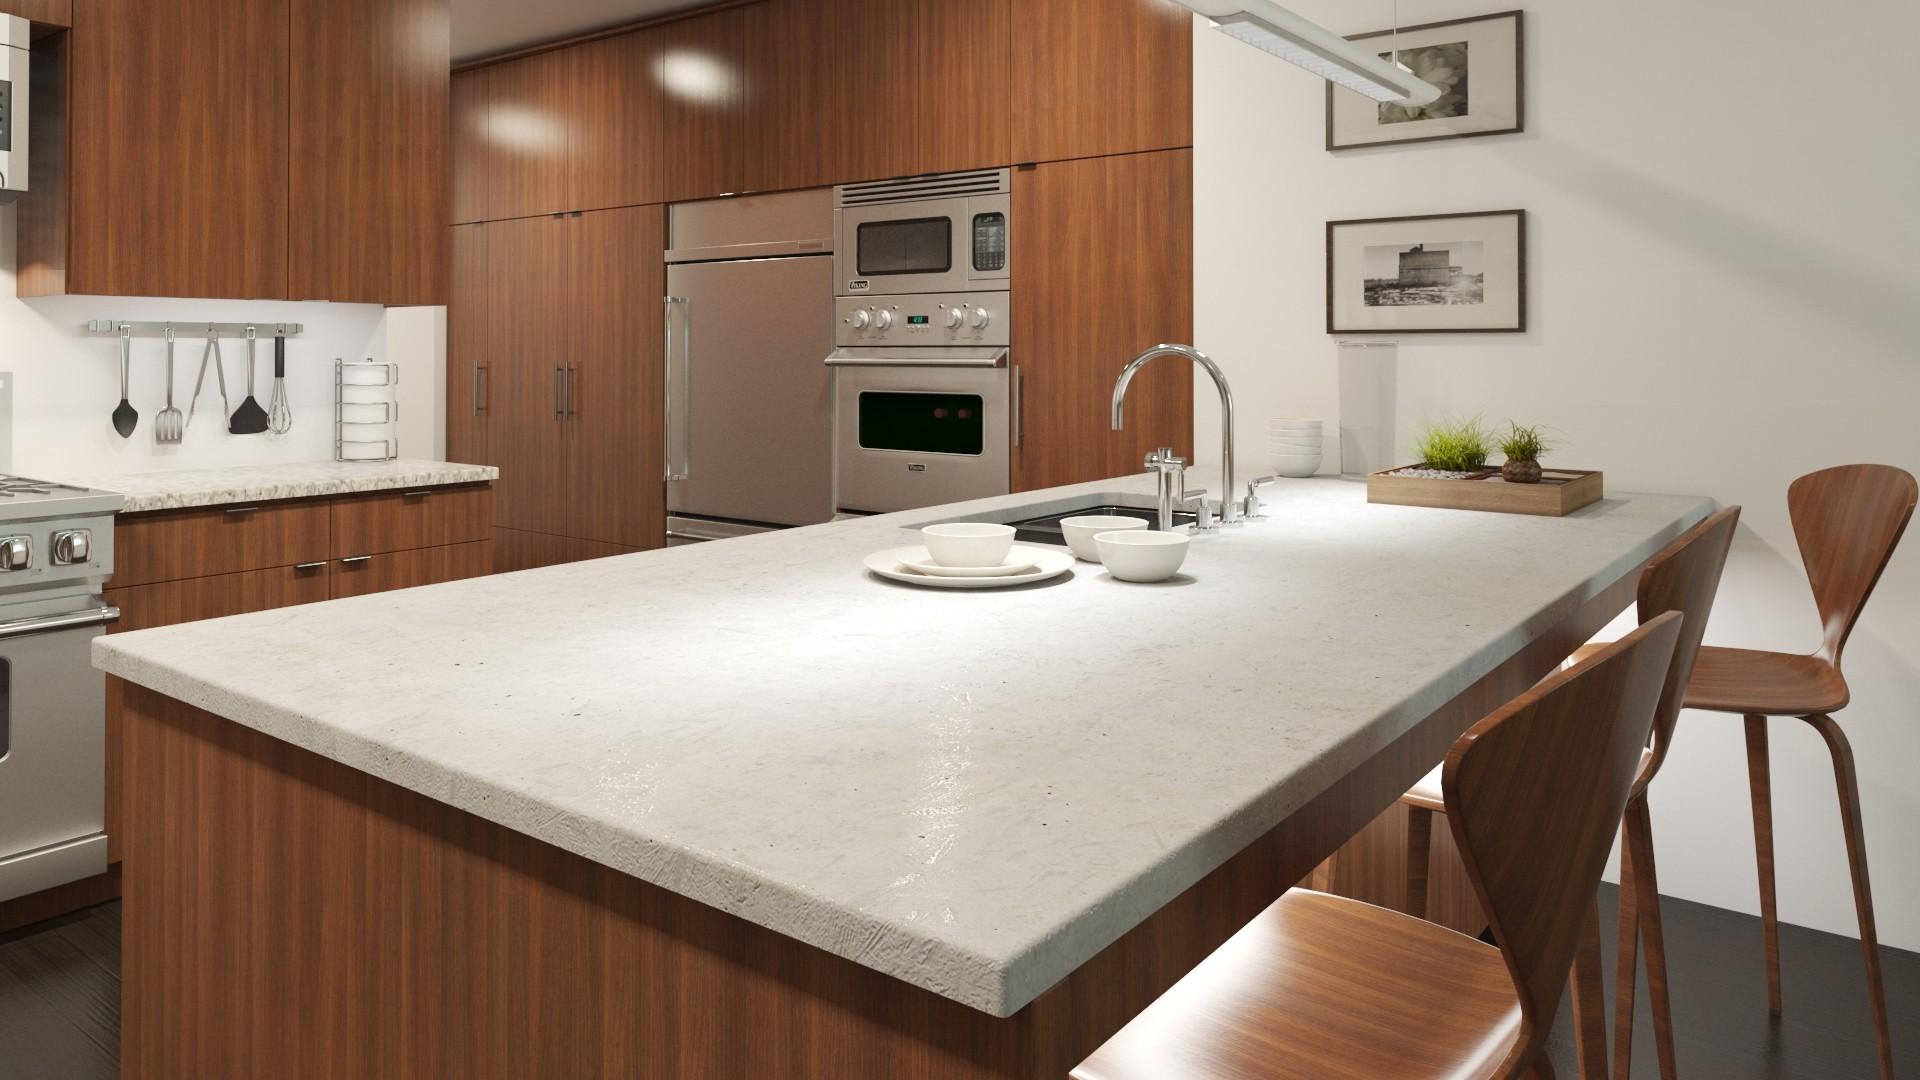 15 favorite kitchen countertop materials. Black Bedroom Furniture Sets. Home Design Ideas